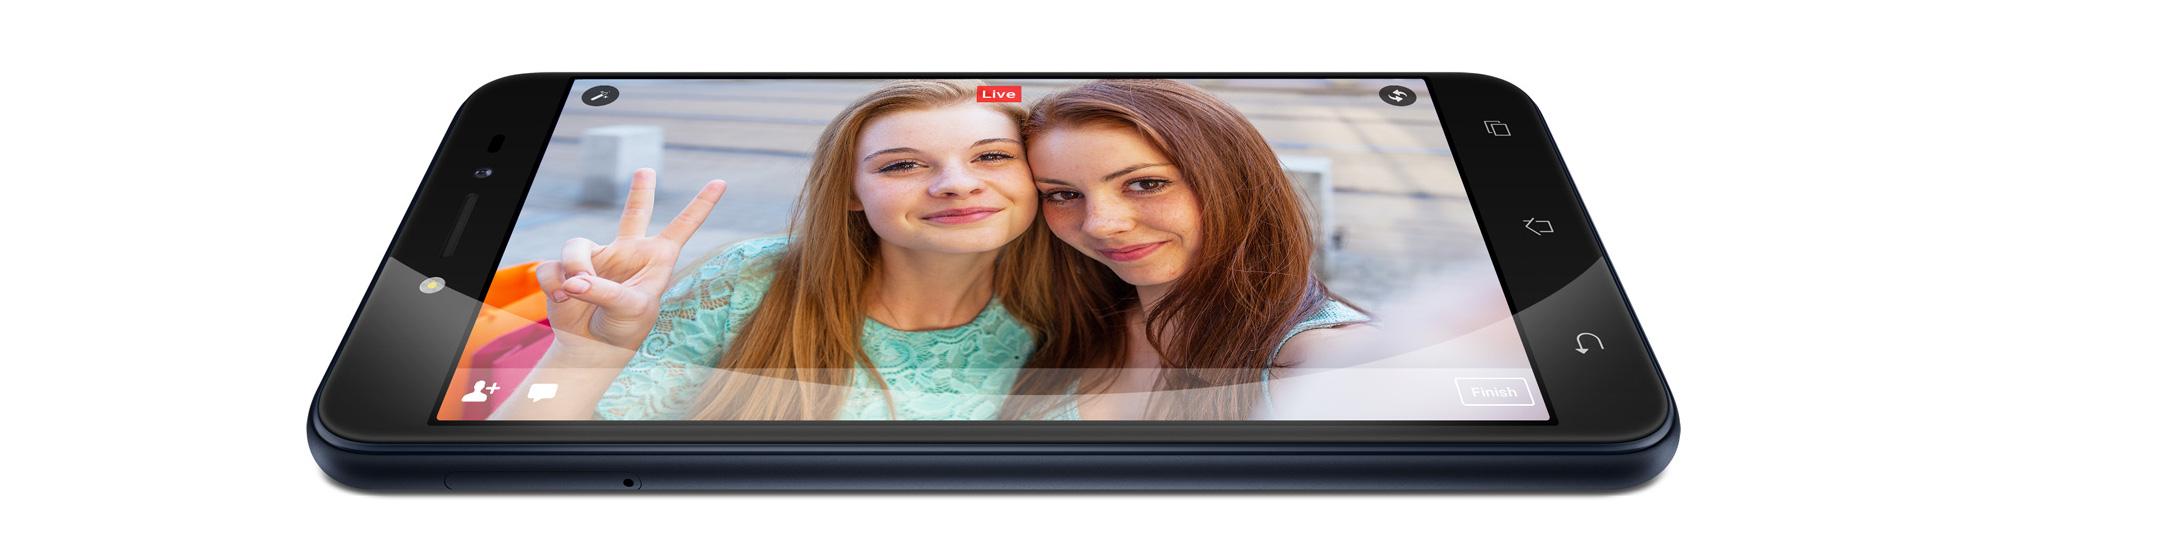 ASUS ZenFone Live (ZB501KL)_00004